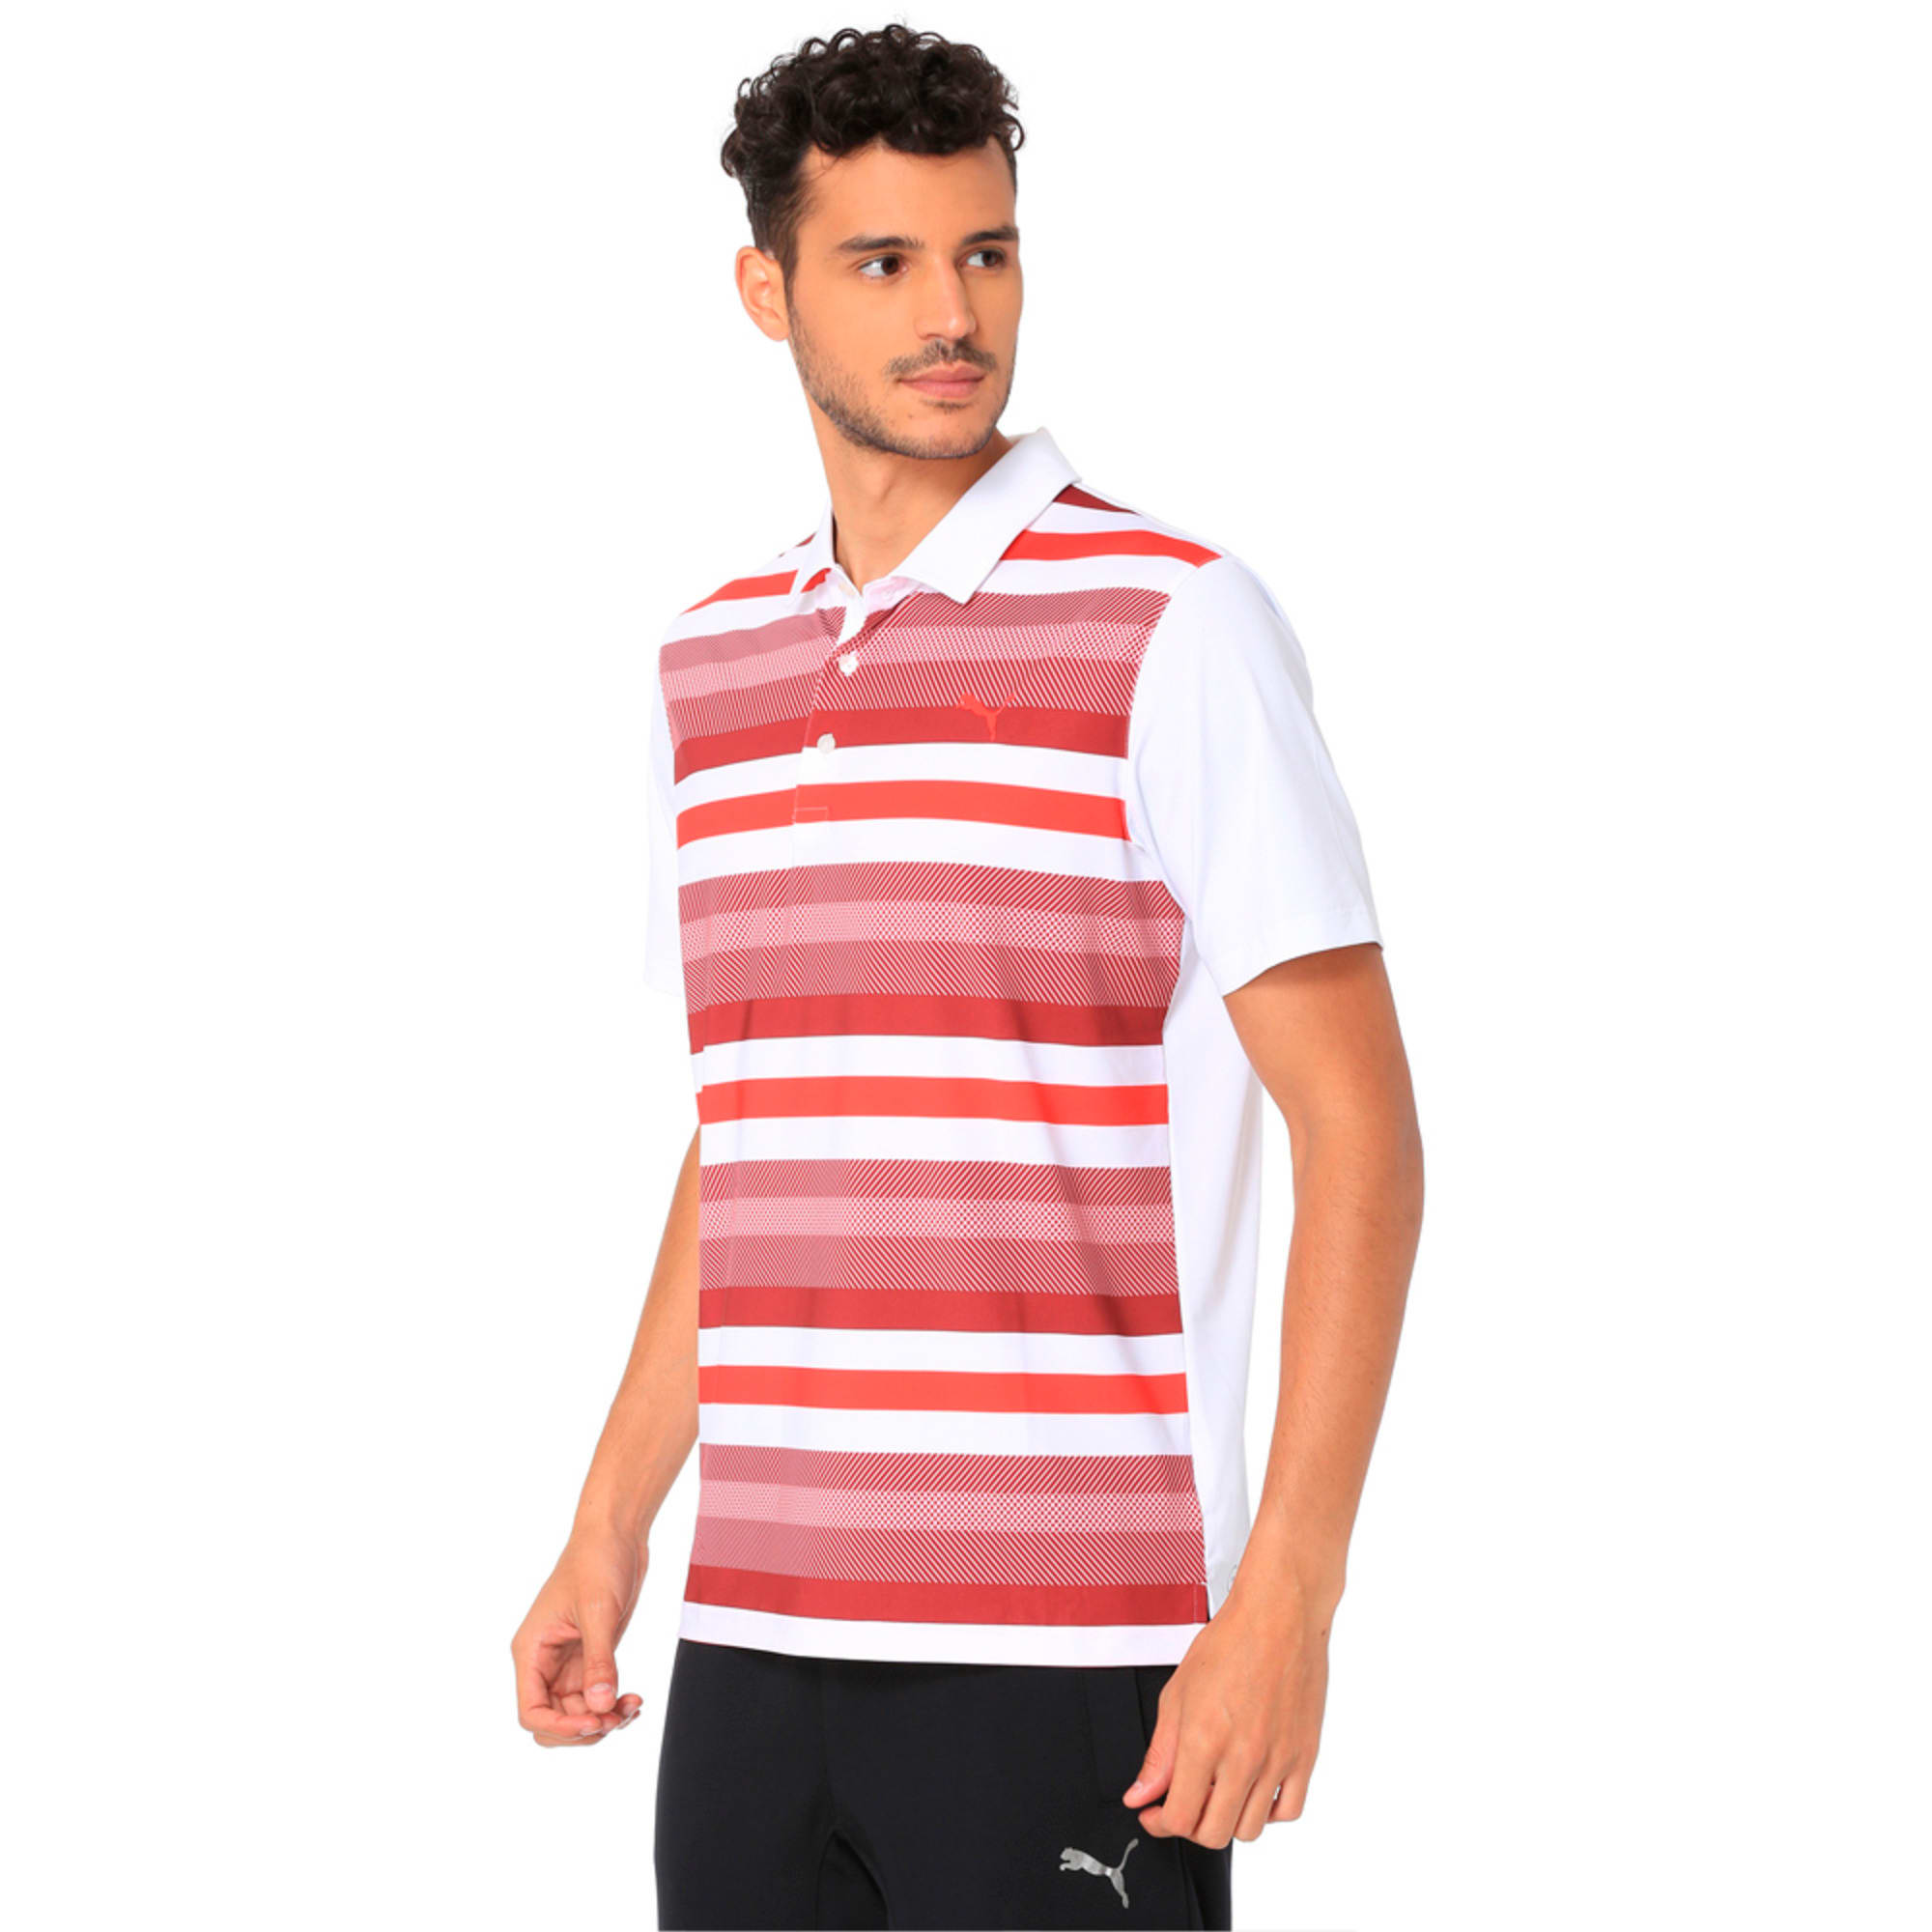 Thumbnail 5 of Golf Men's Turf Stripe Polo, Bright White-Pomegranate, medium-IND